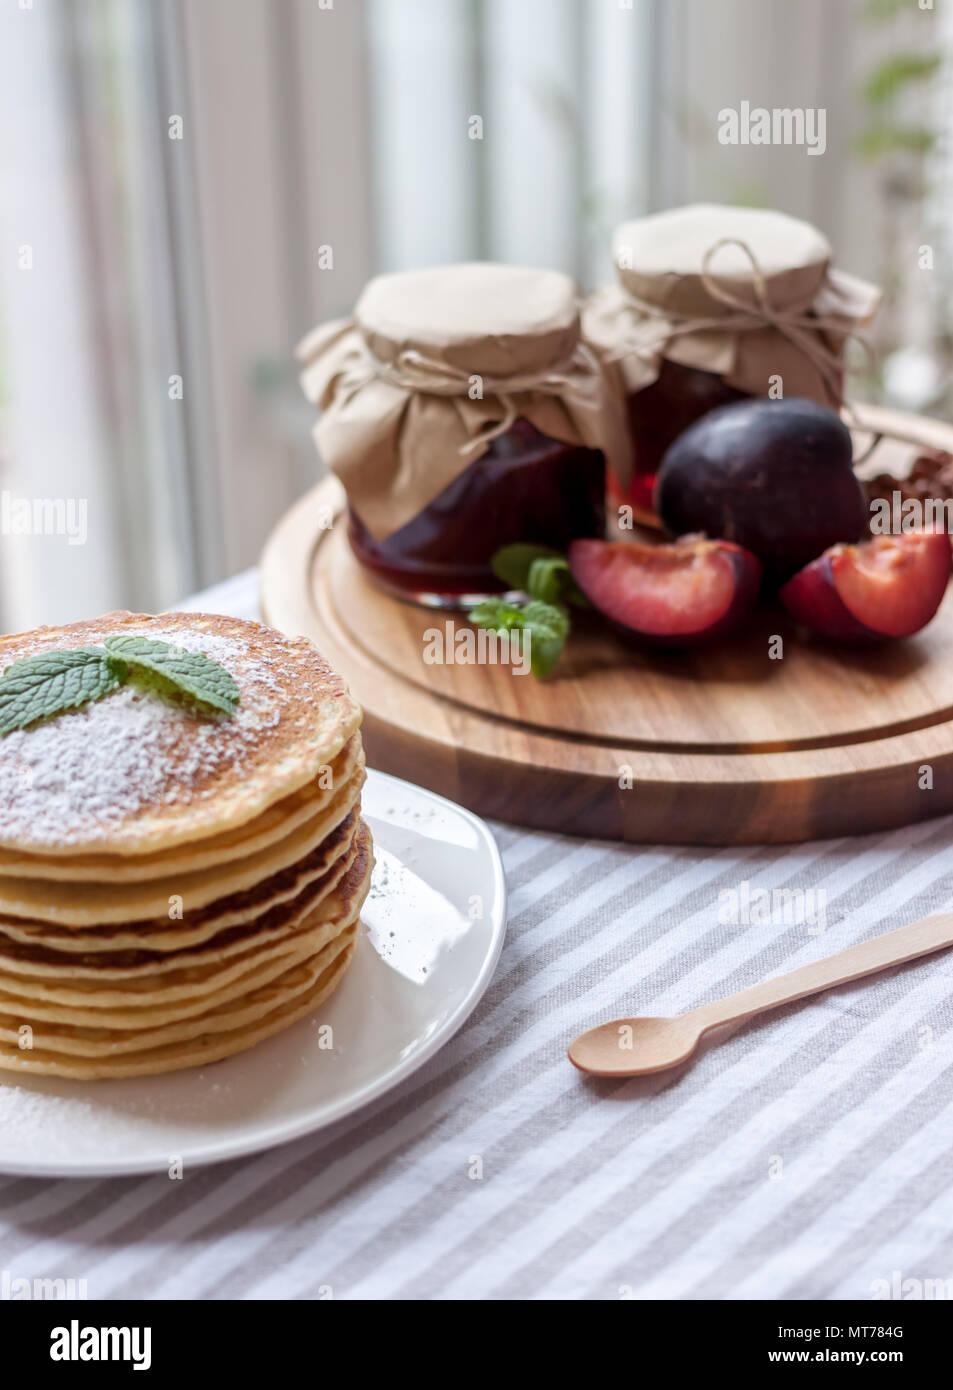 pancakes with jam breakfast - Stock Image